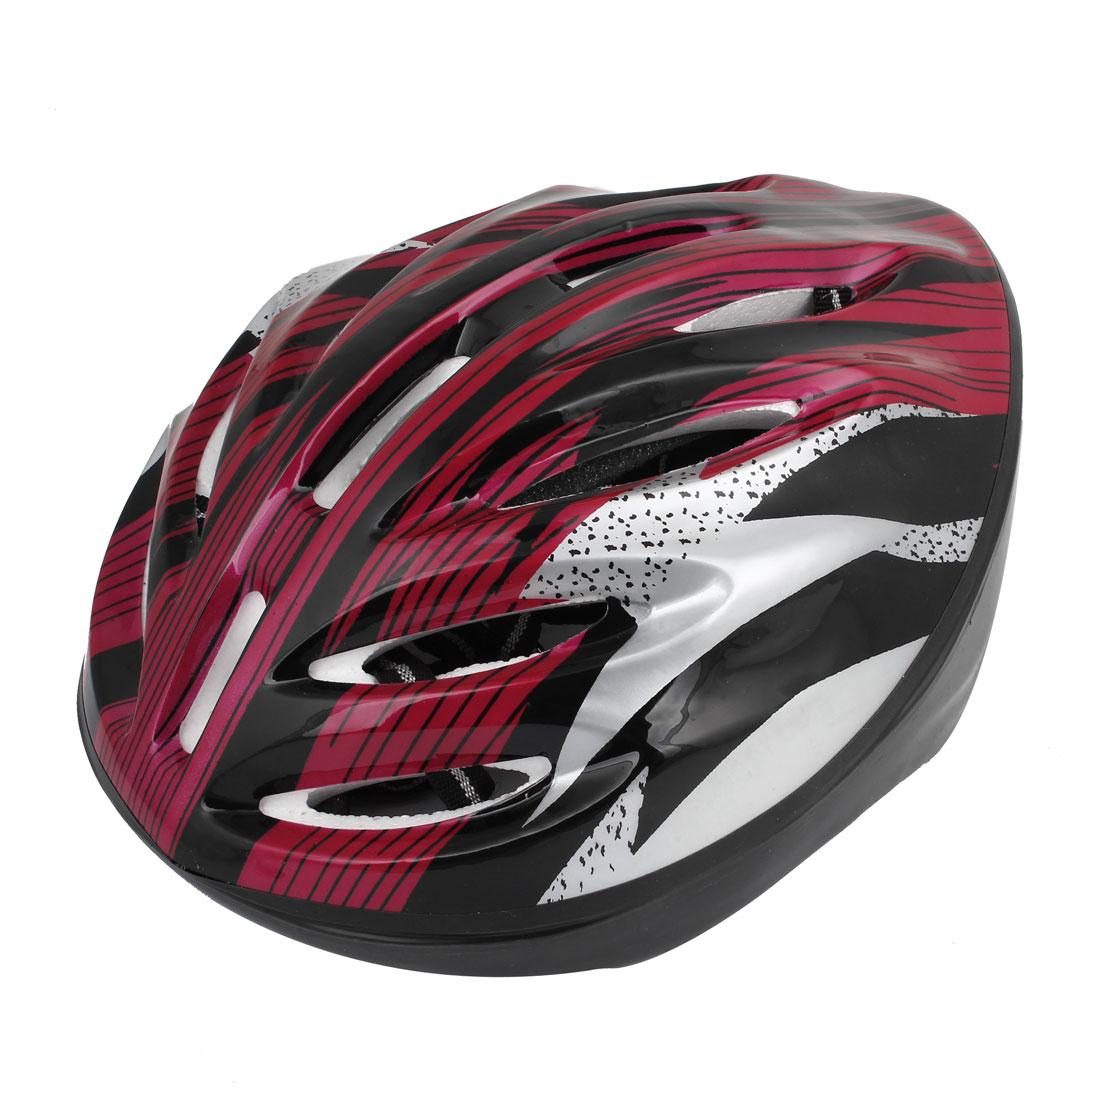 Adult Red Black Sponge Pad Adjustable Head Strap Outdoor Safety Bicycle Bike Skateboard Helmet